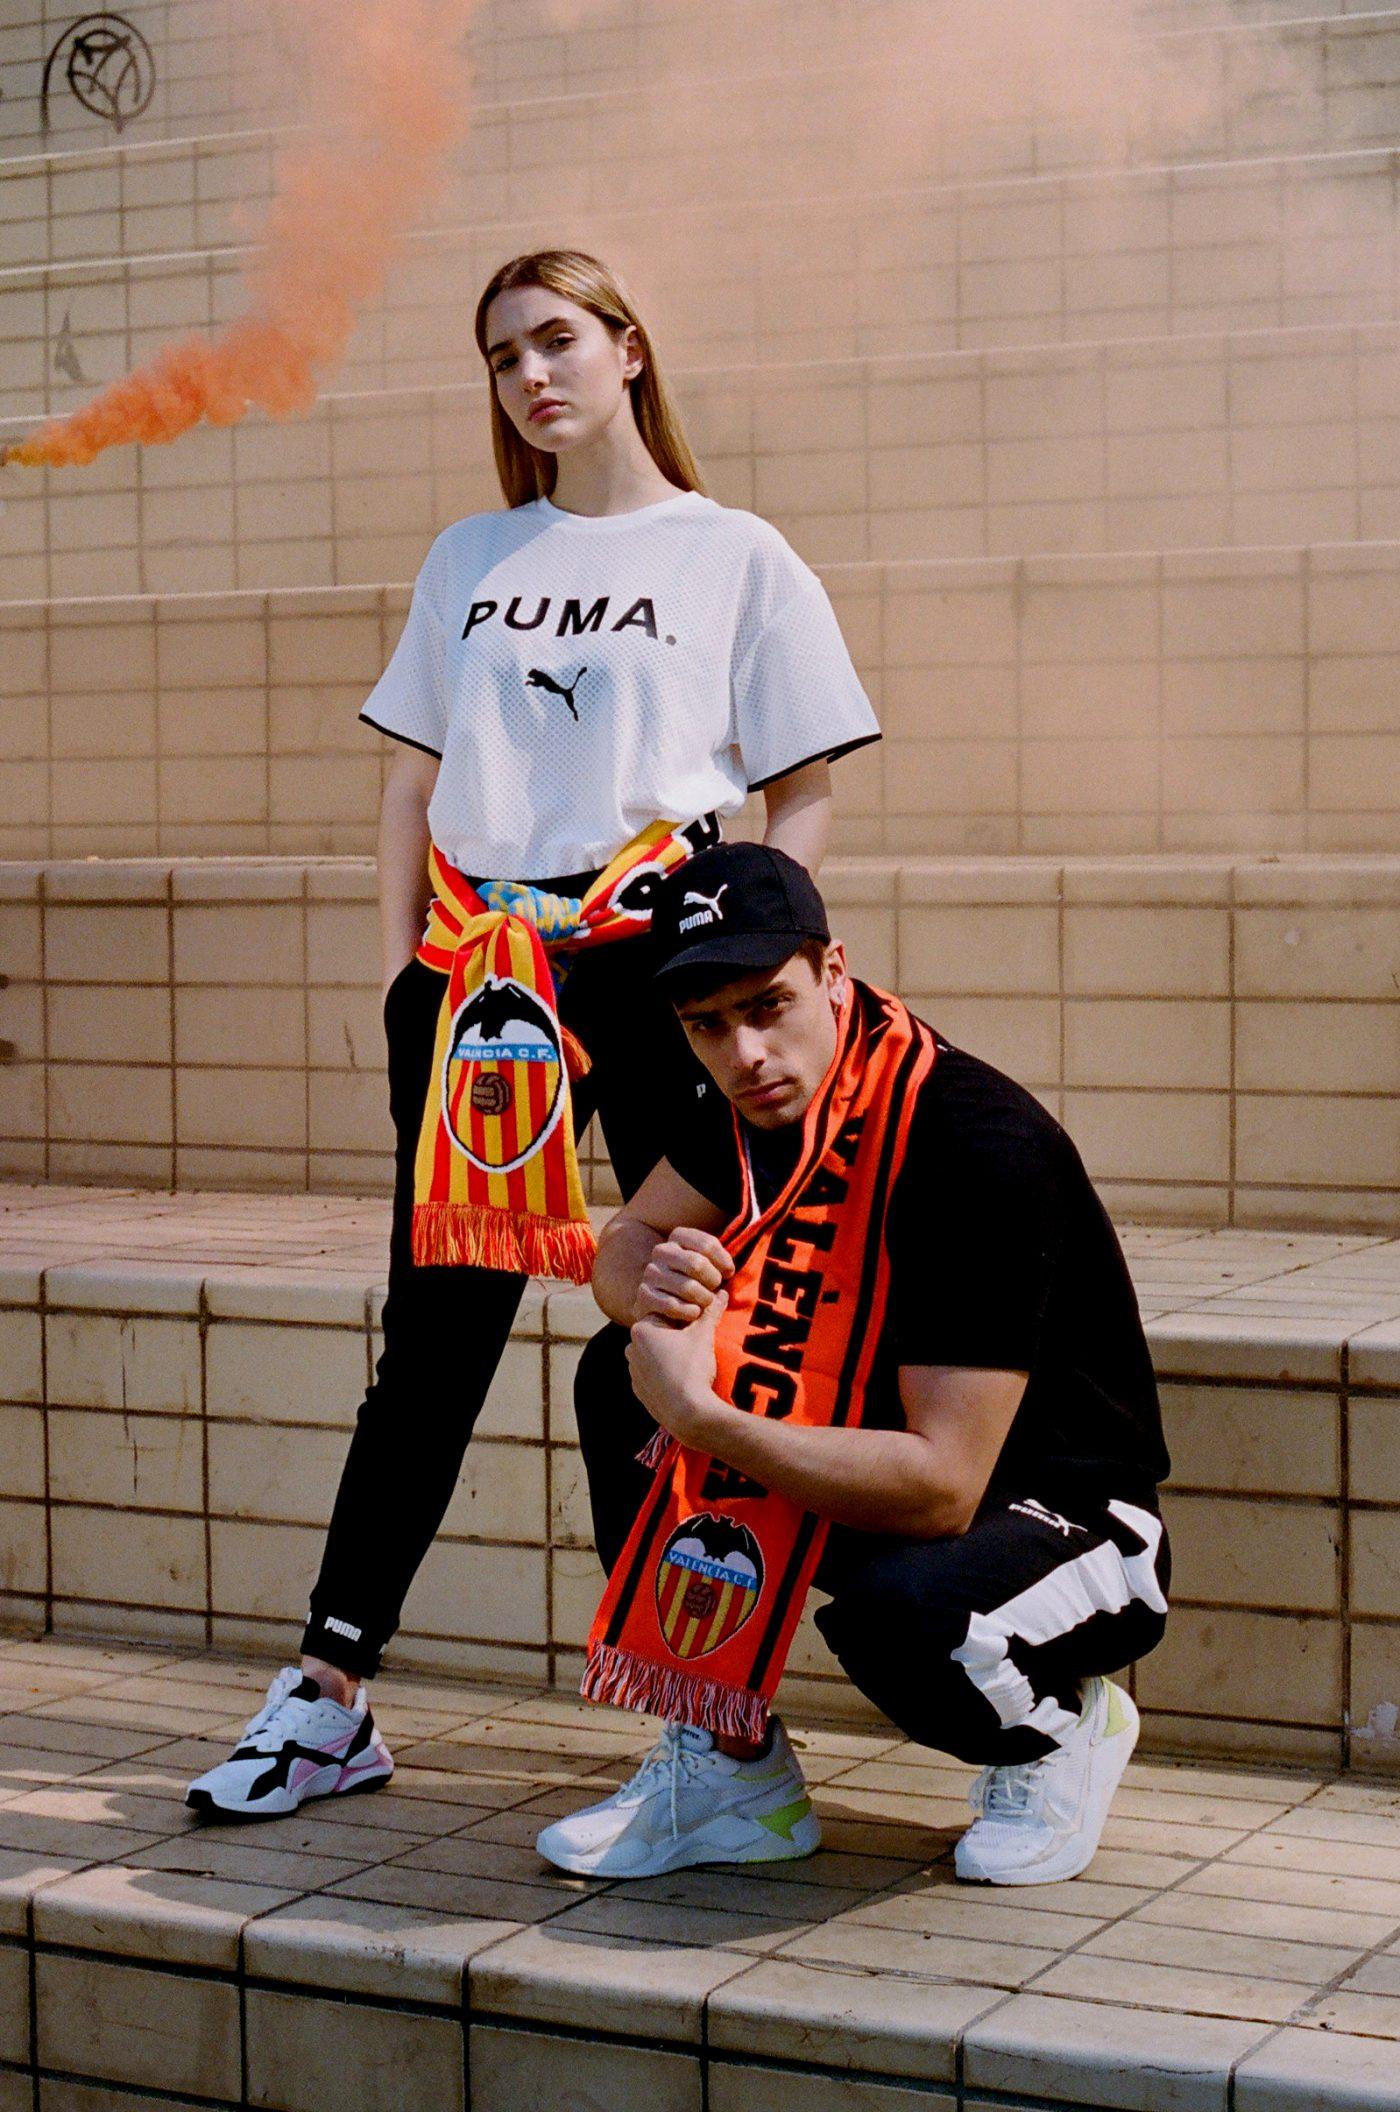 puma-signature-equipementier-fc-valence-1